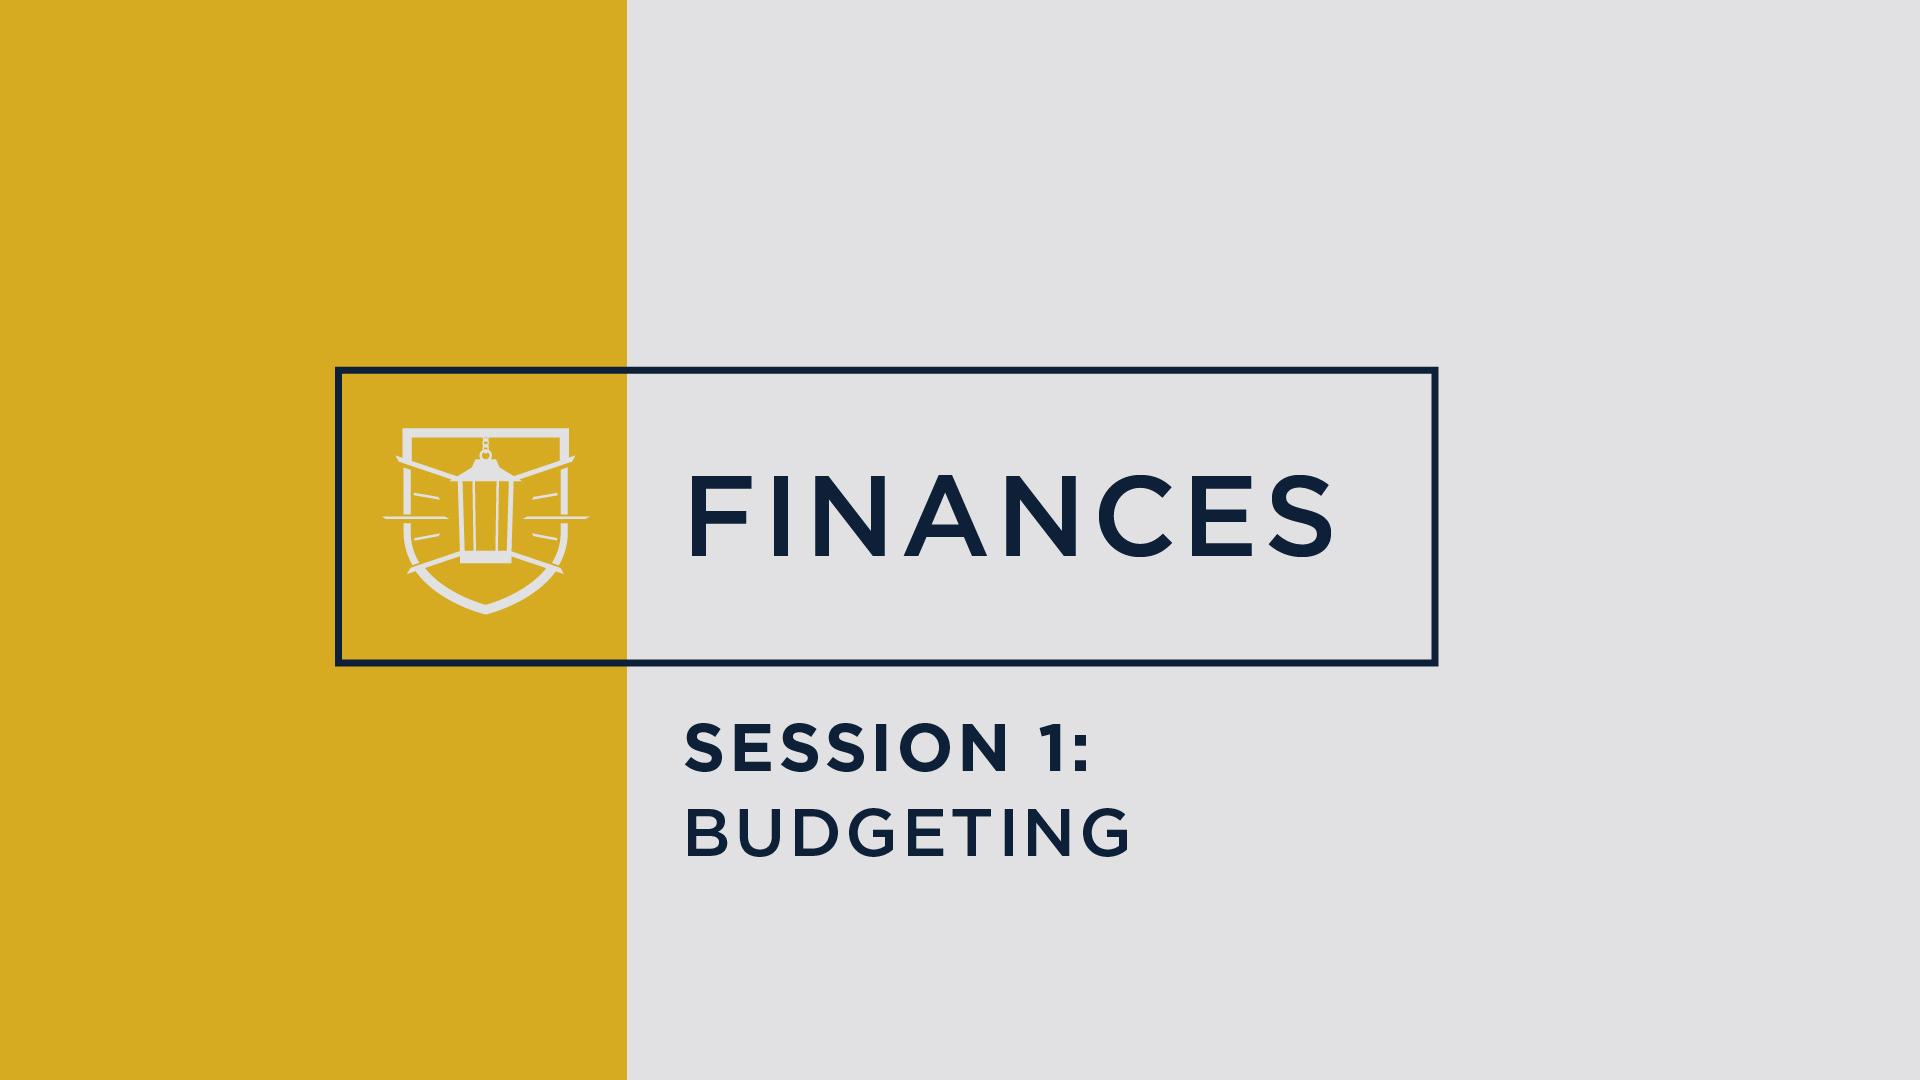 Finances 1: Budgeting